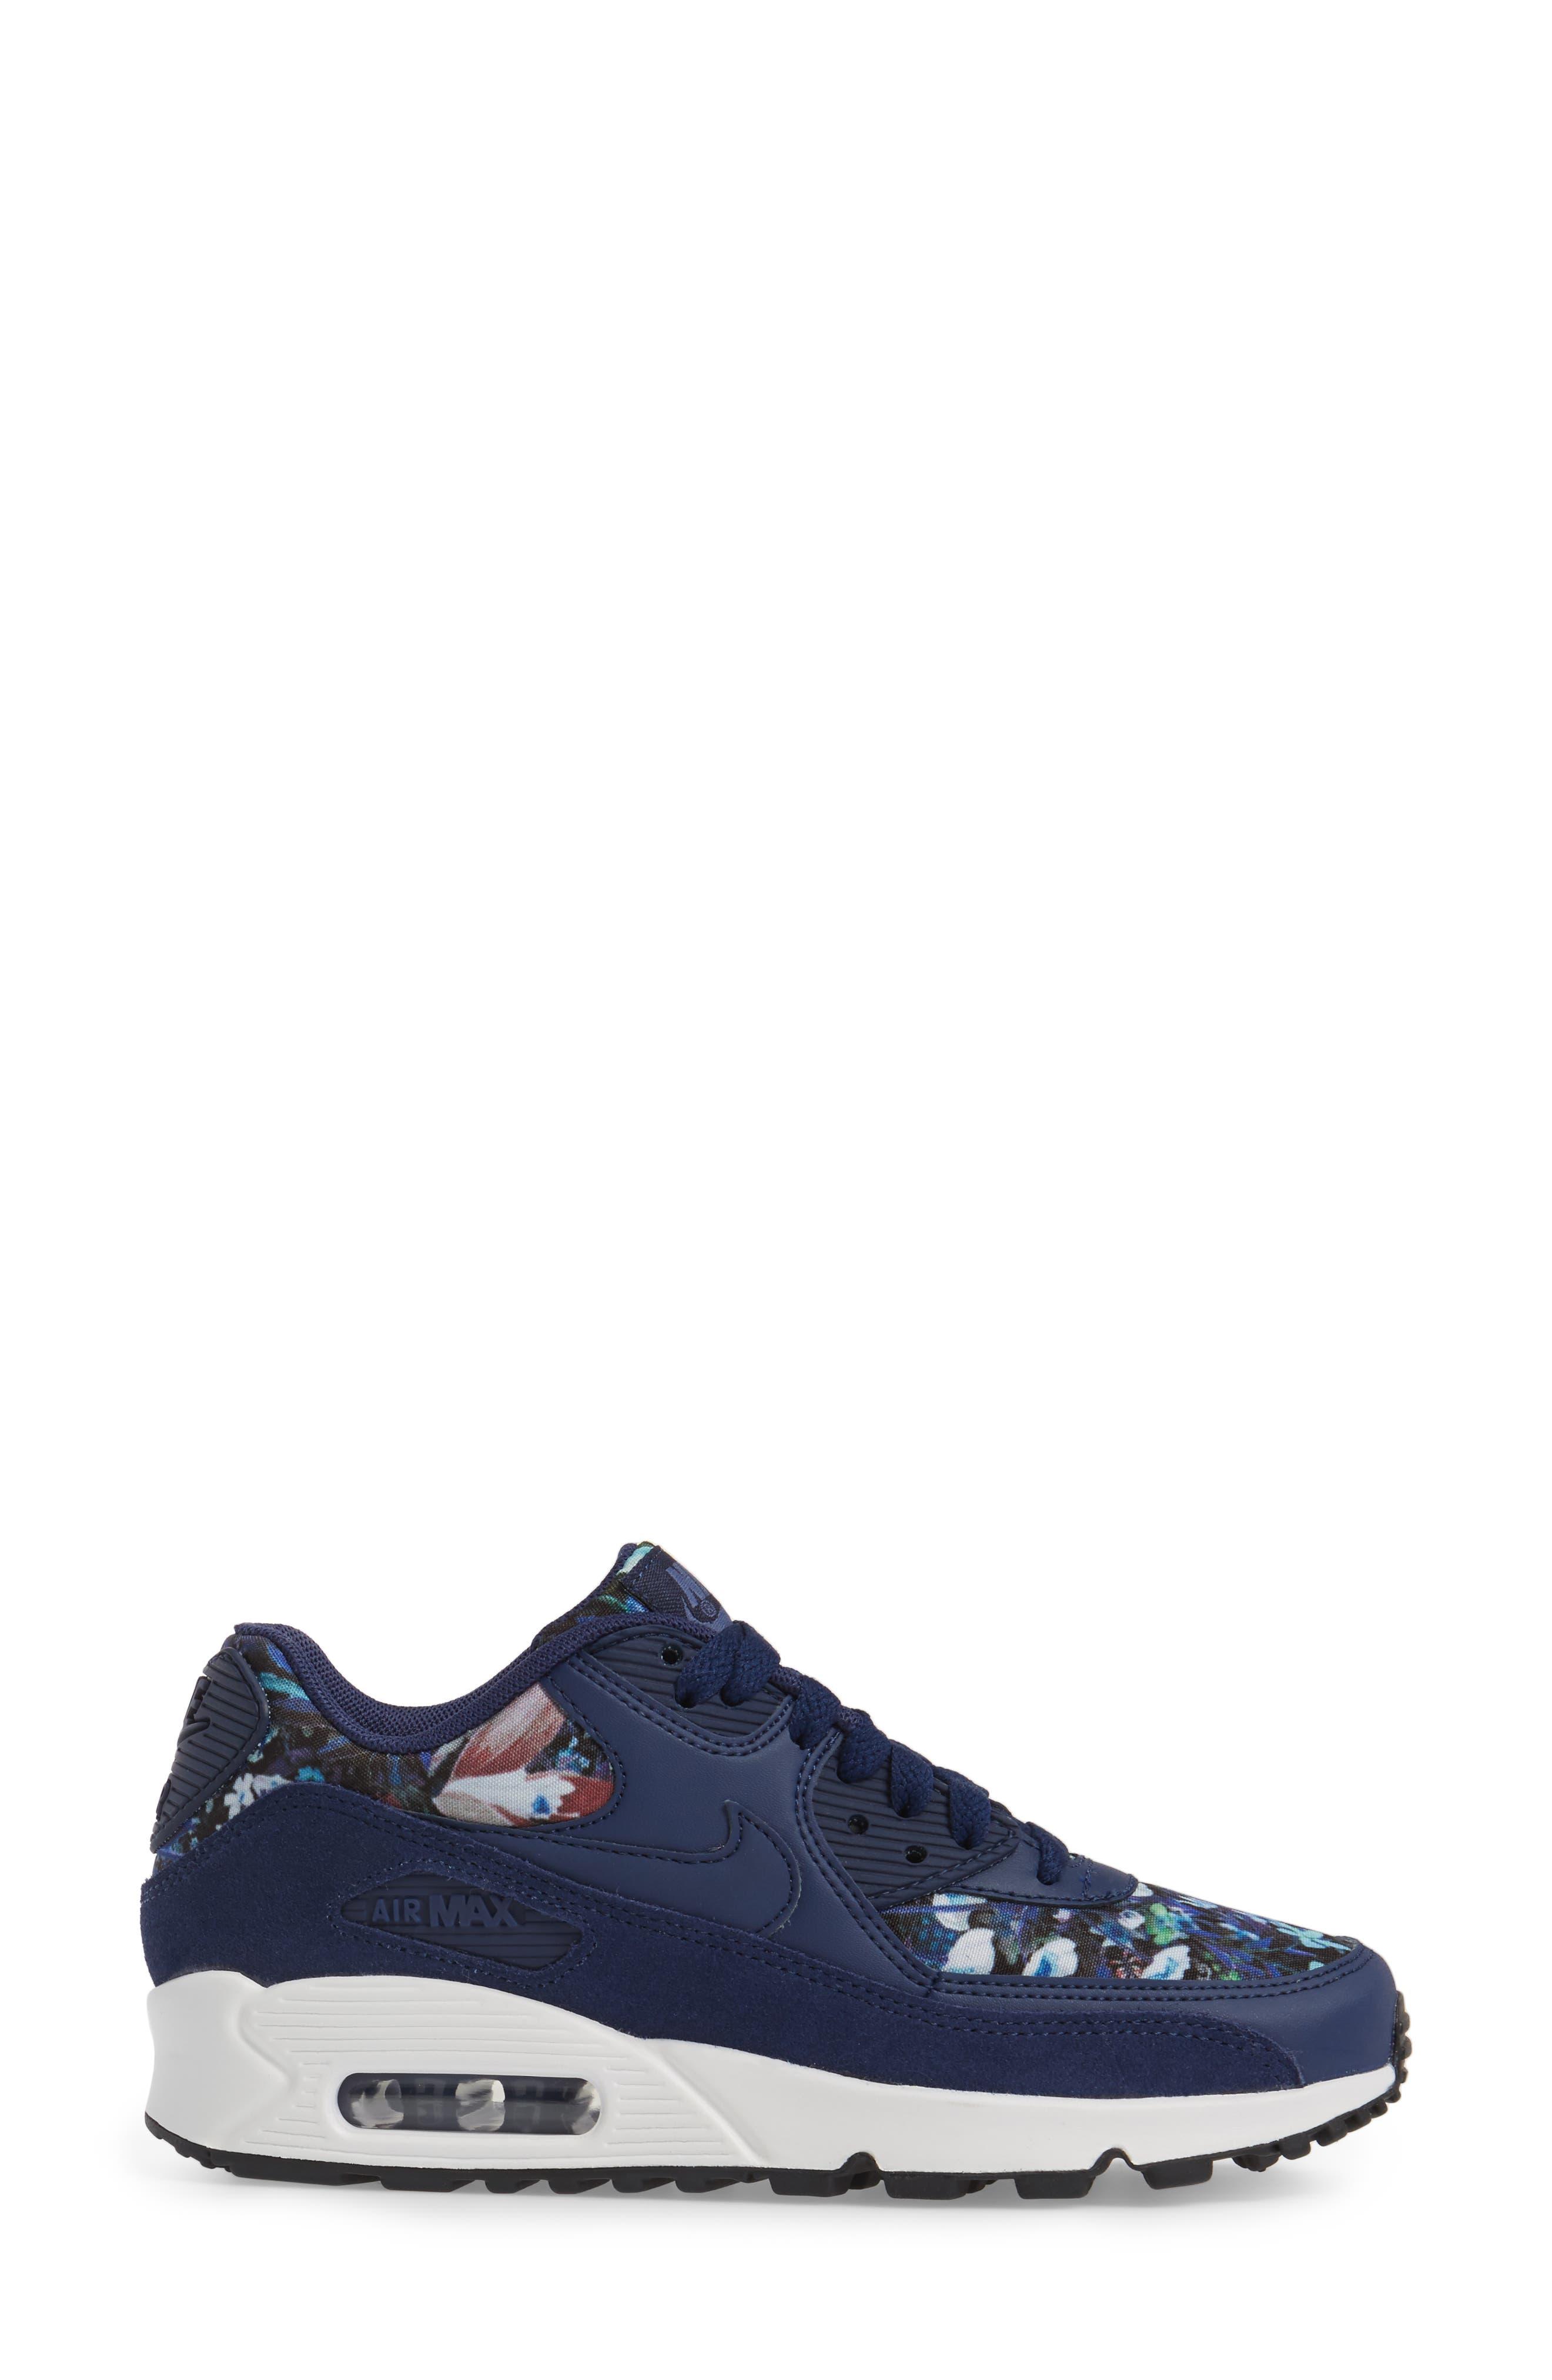 Air Max 90 SE Sneaker,                             Alternate thumbnail 24, color,